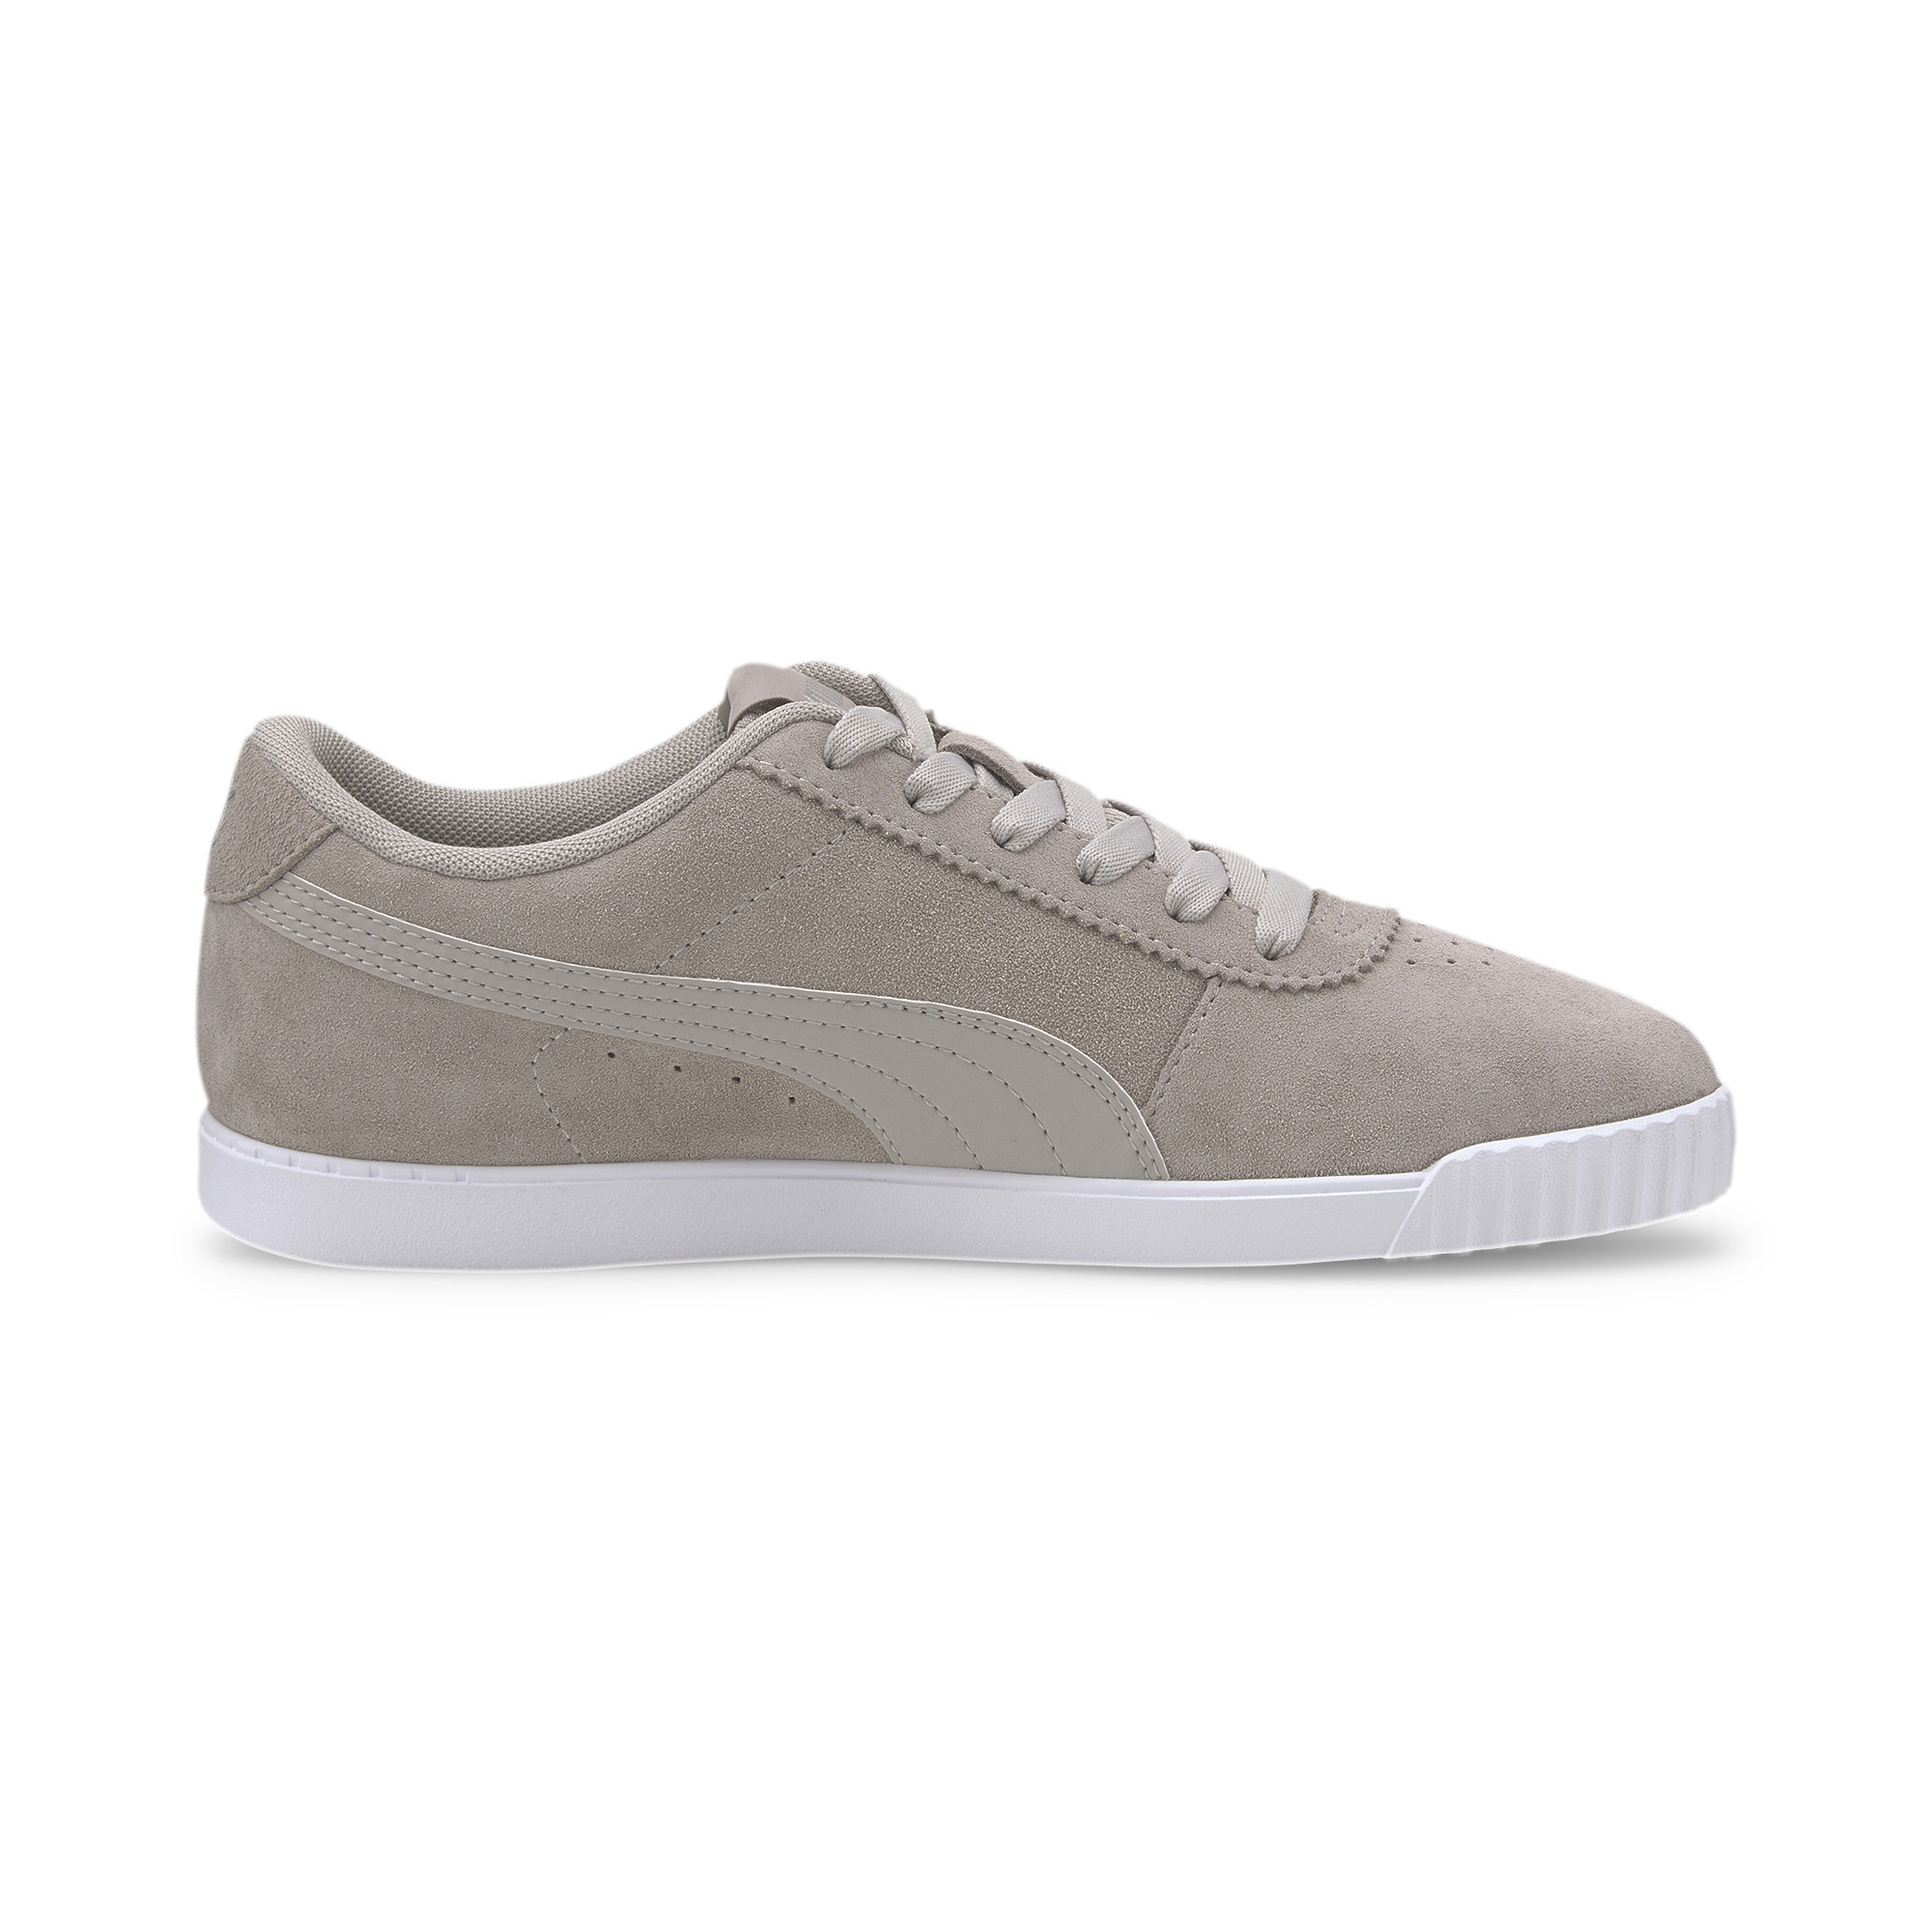 PUMA-Women-039-s-Carina-Slim-Suede-Sneakers thumbnail 7